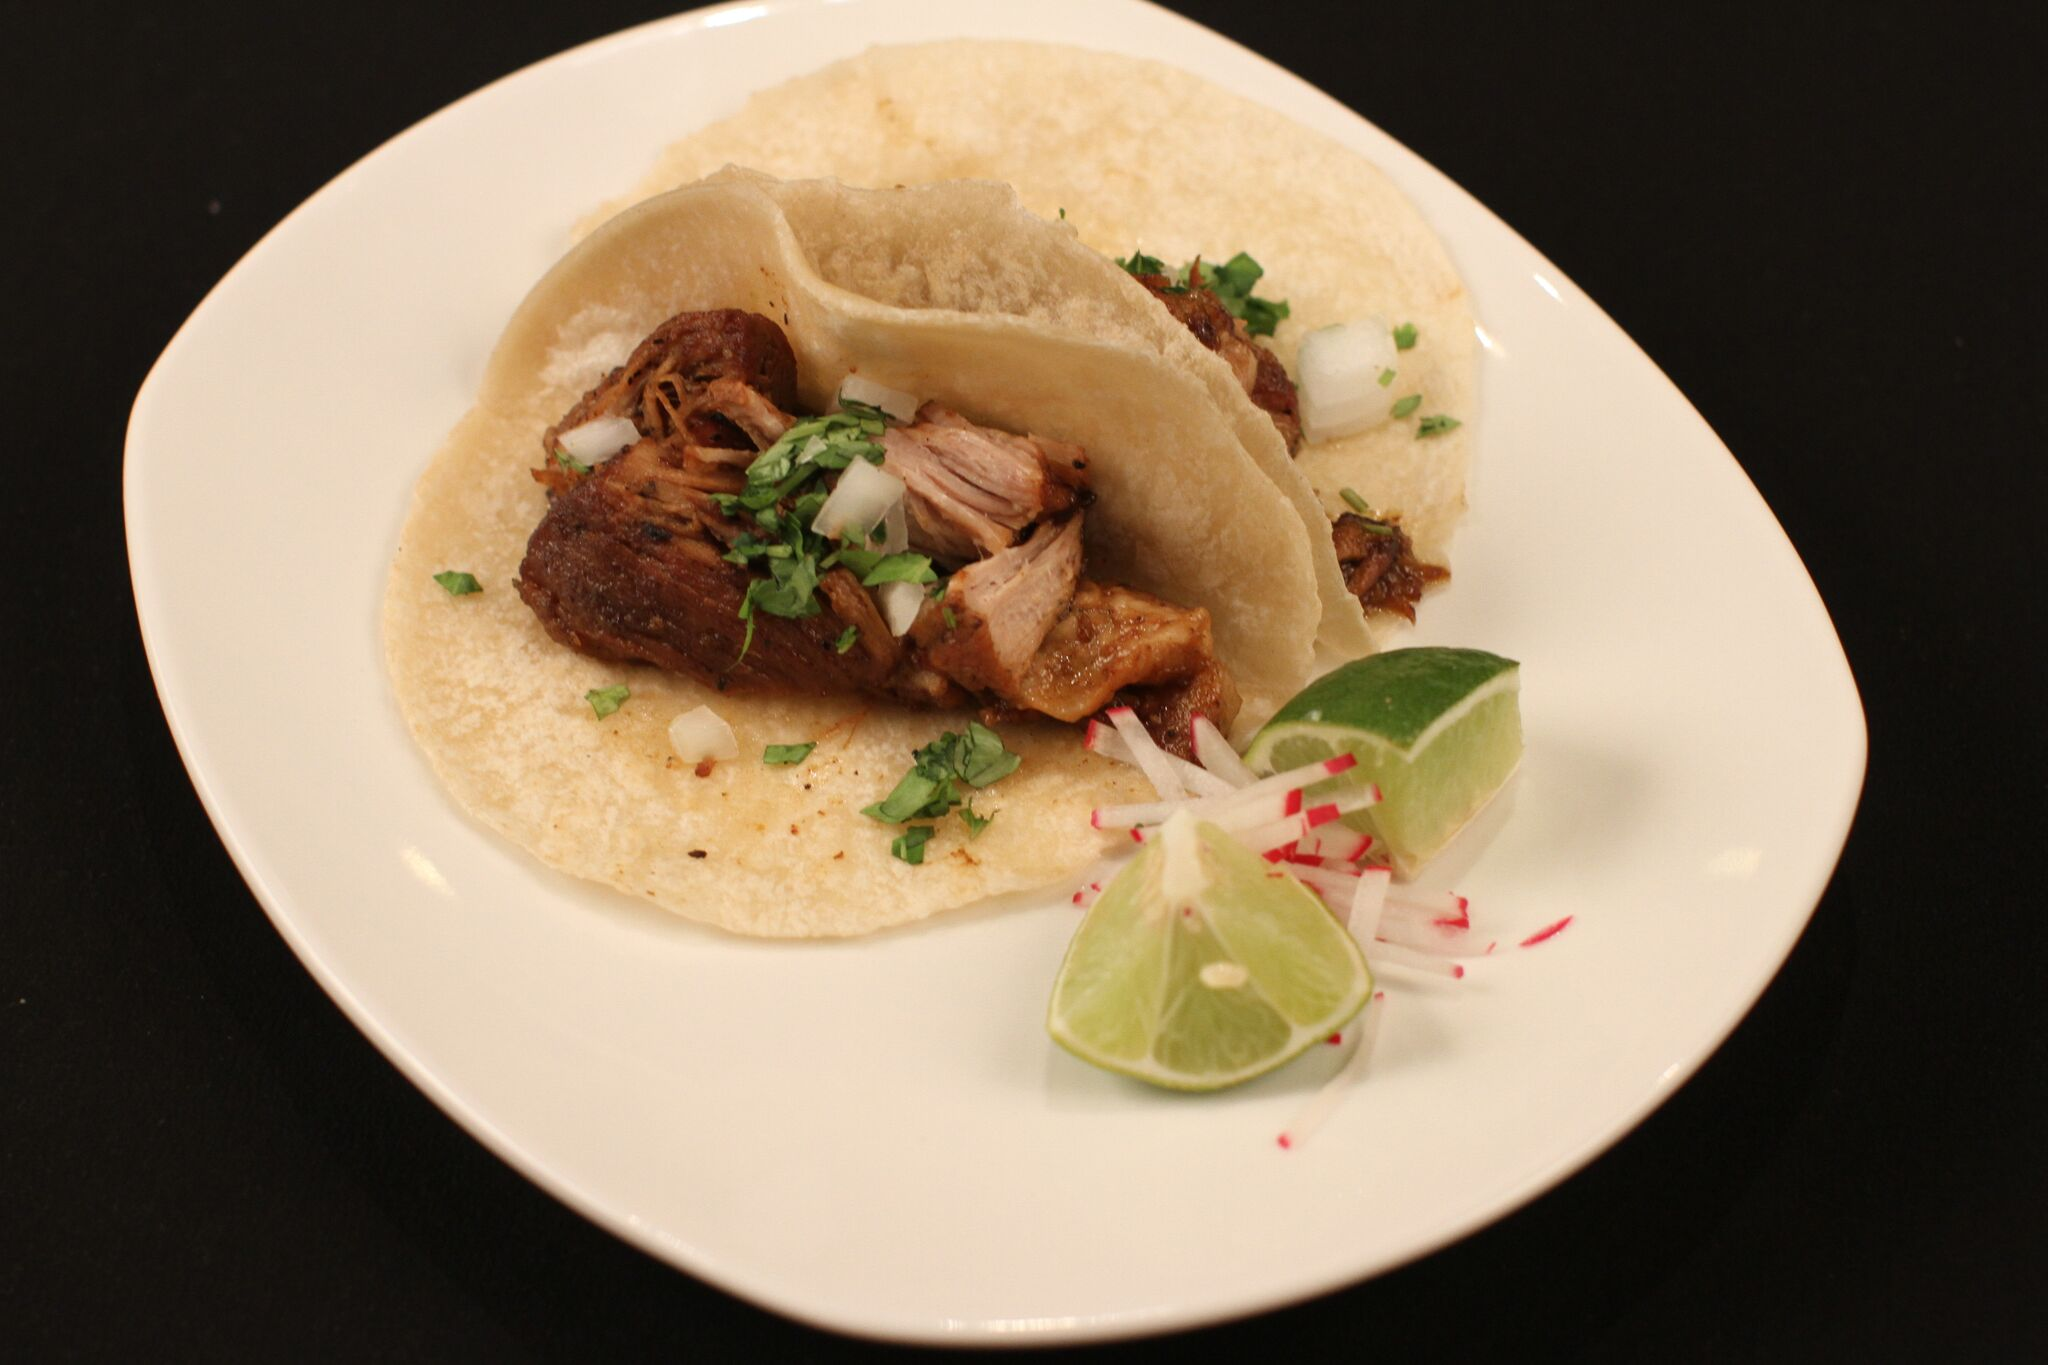 BRUNCH MENU for West Des Moines Restaurant Blu Toro Cantina + Grill Menu